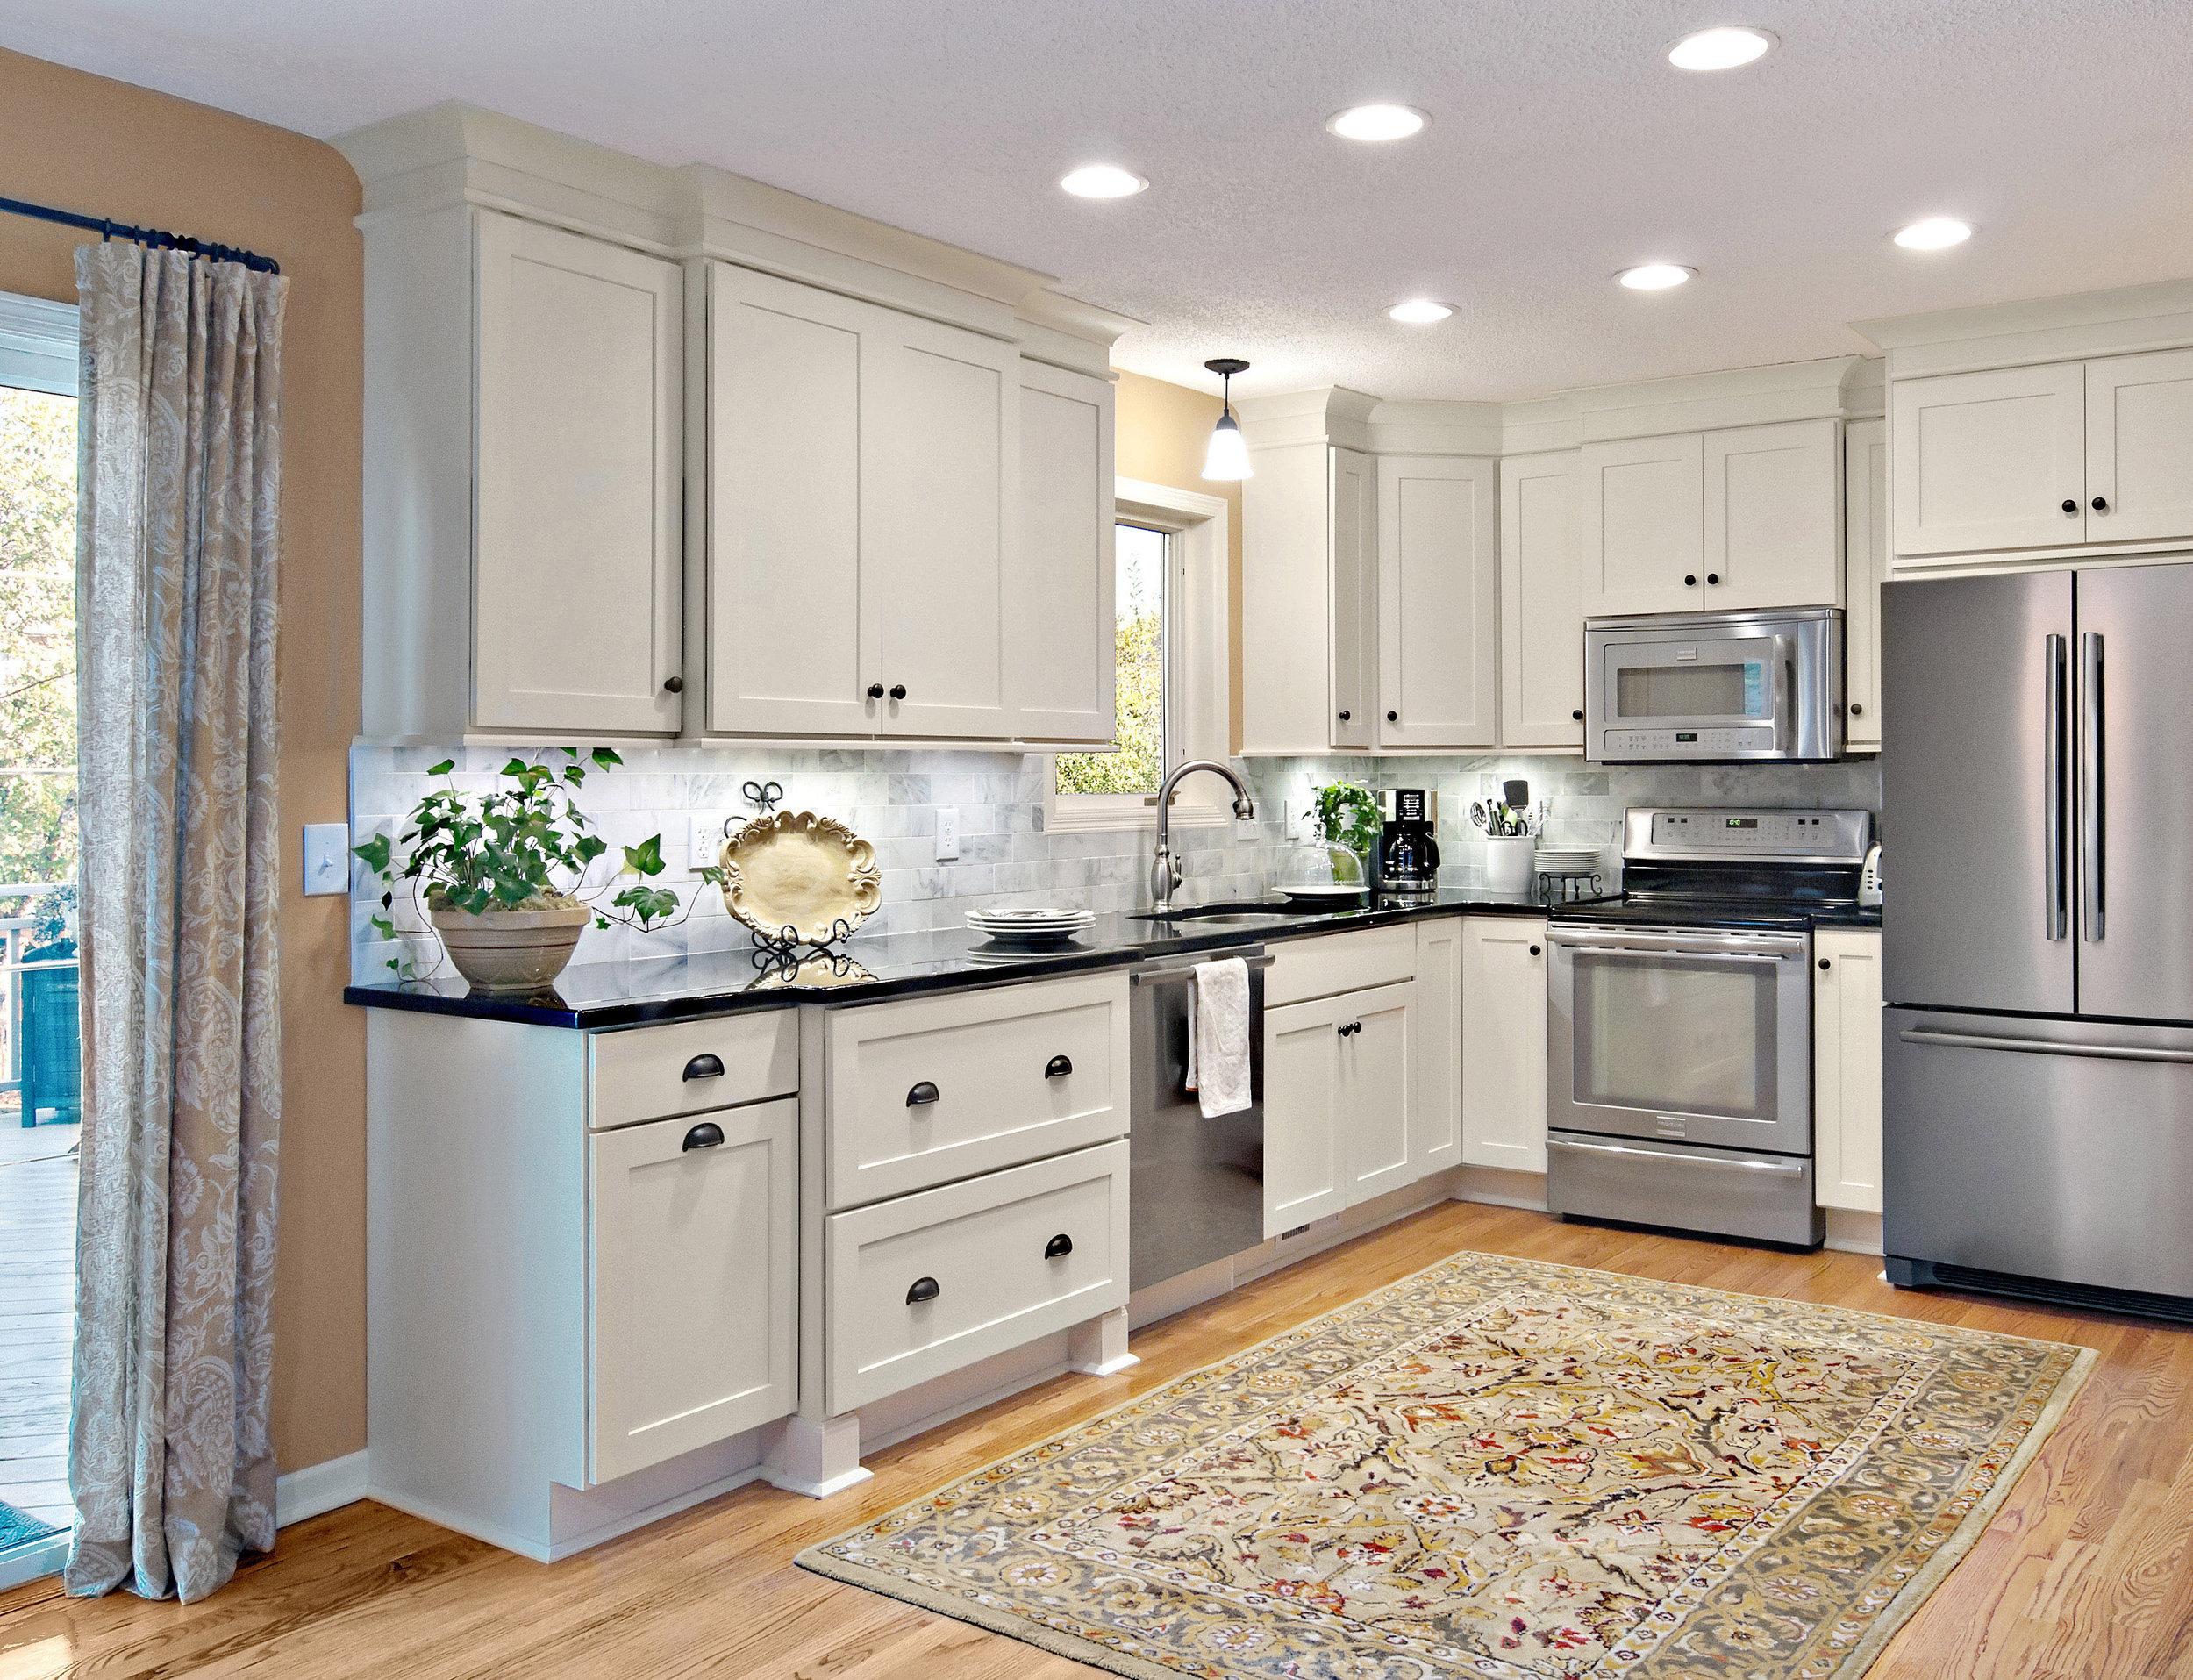 rockford-painted-linen-shaker-cabinets-oa-5875.jpg